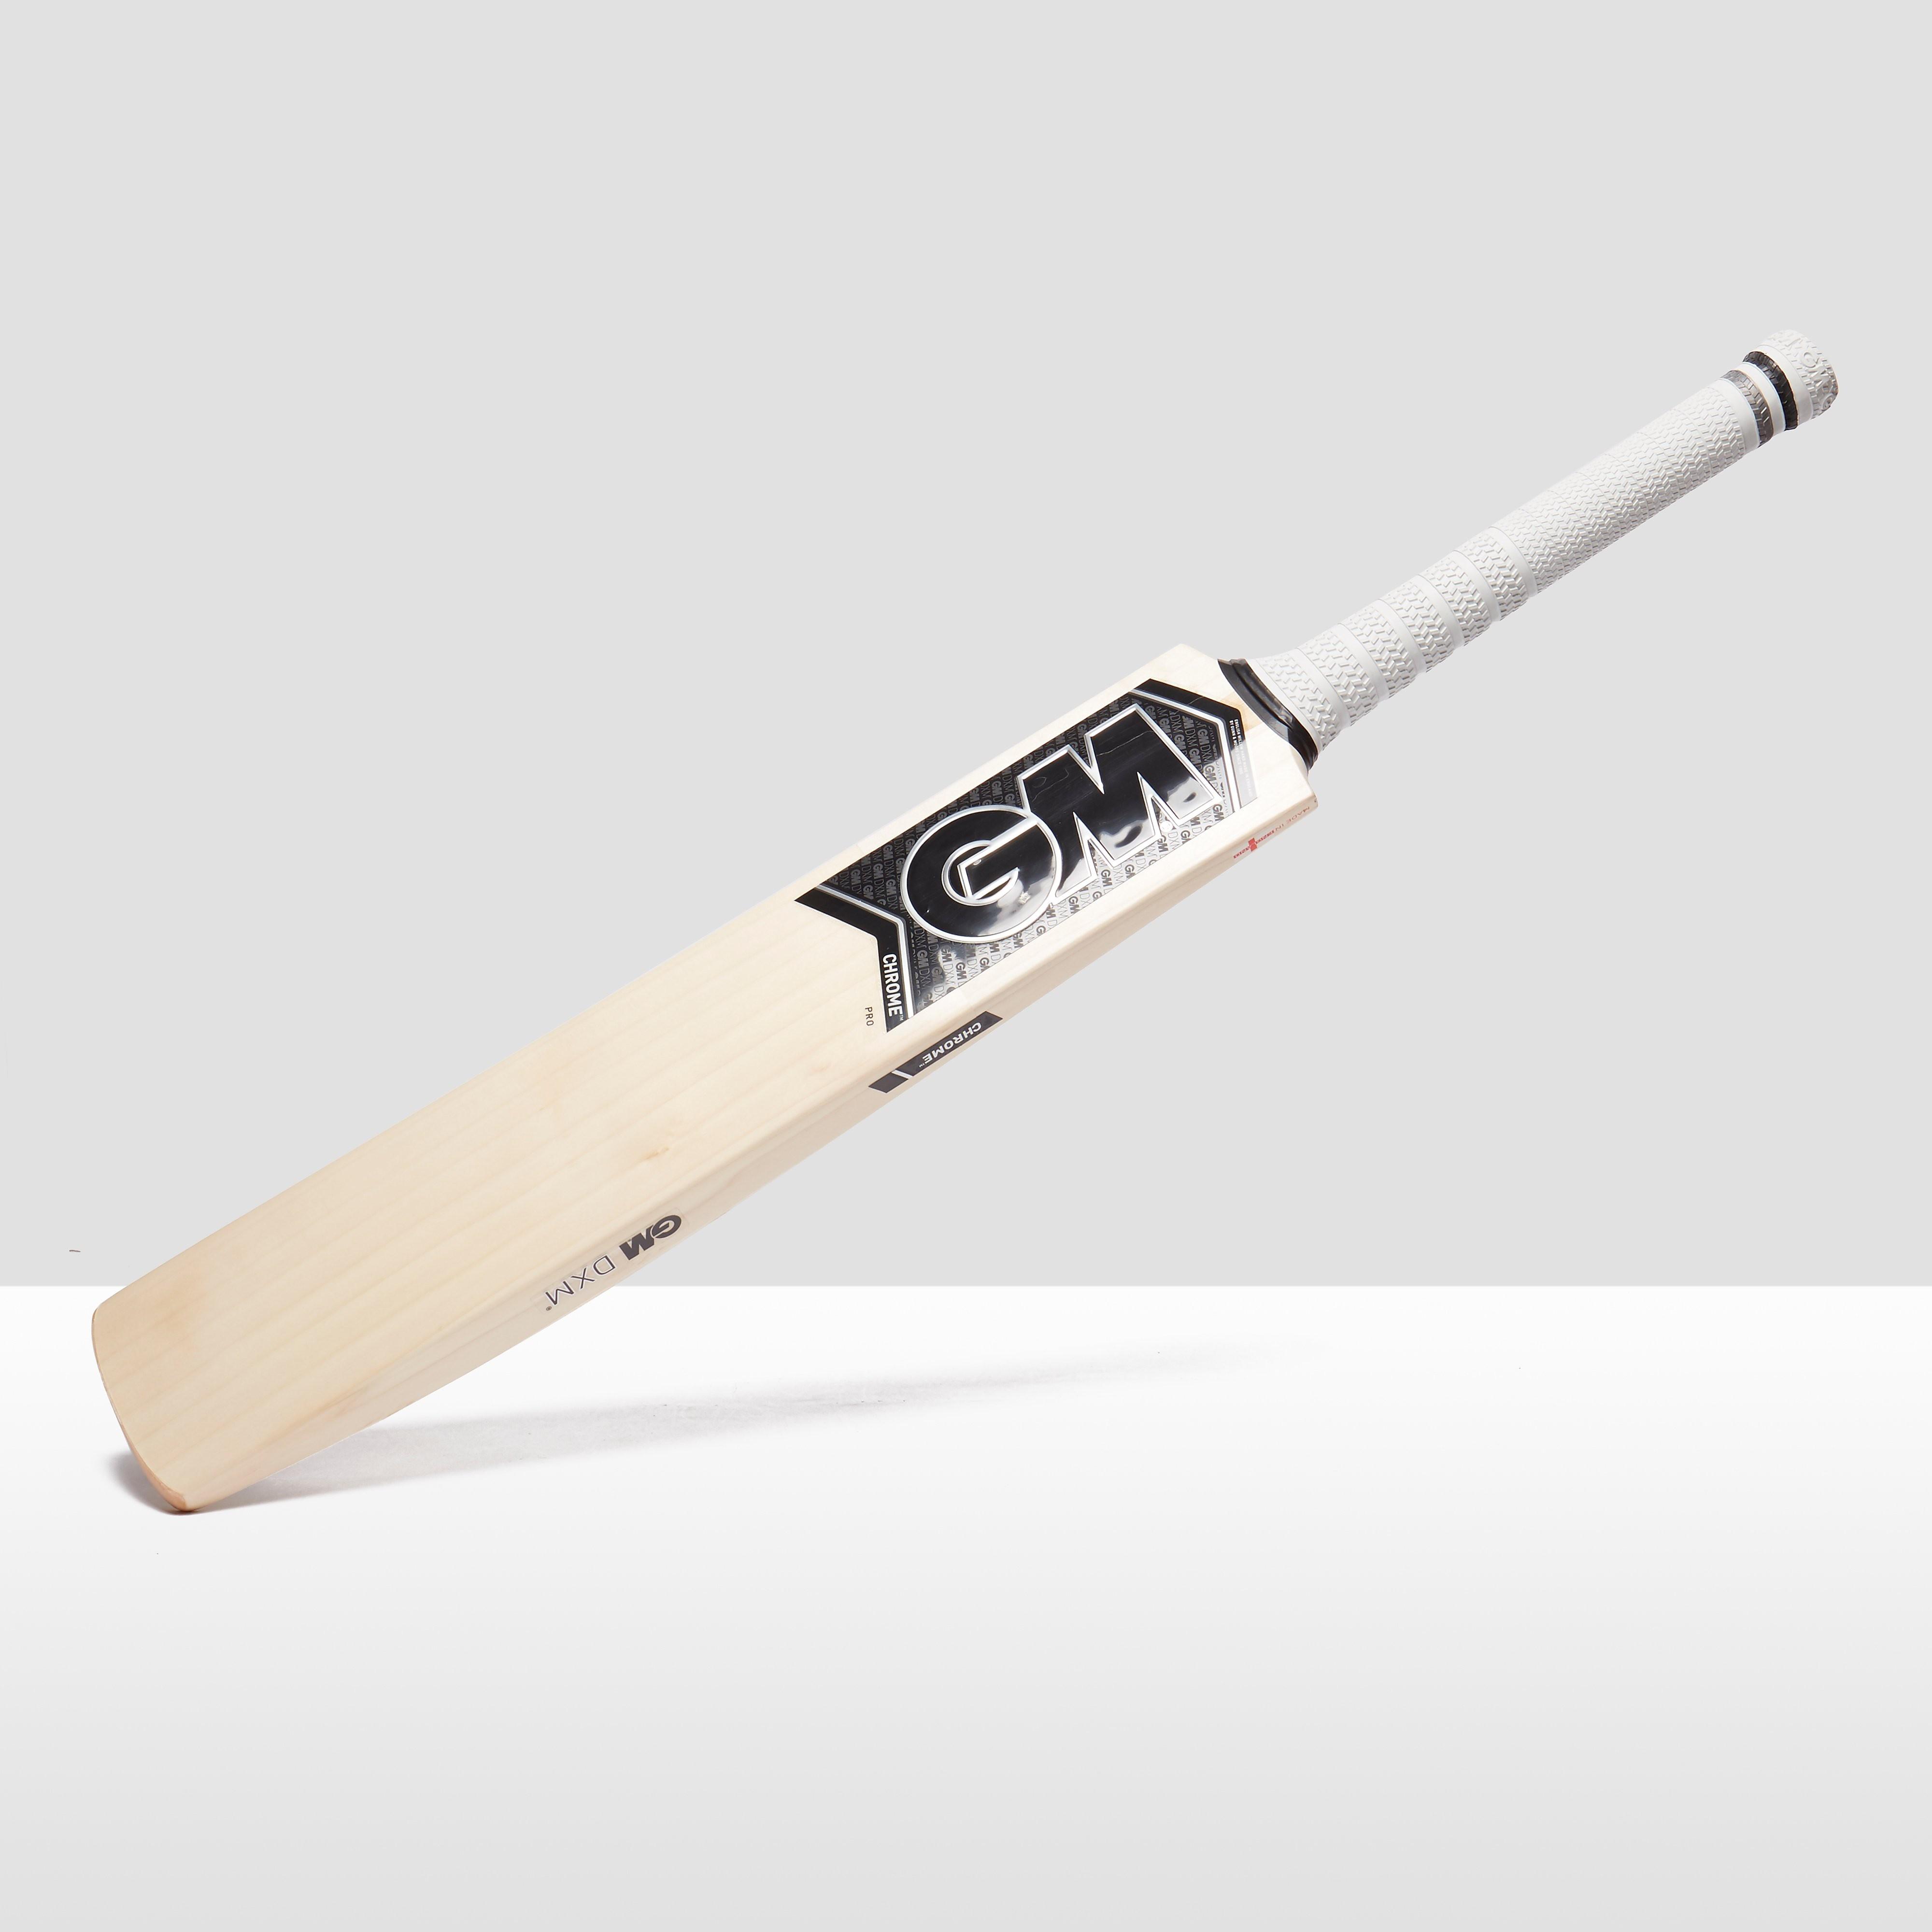 Gunn u0026 Moore Gunn & Moore Chrome L555 Dxm 808 Cricket Bat - White, White